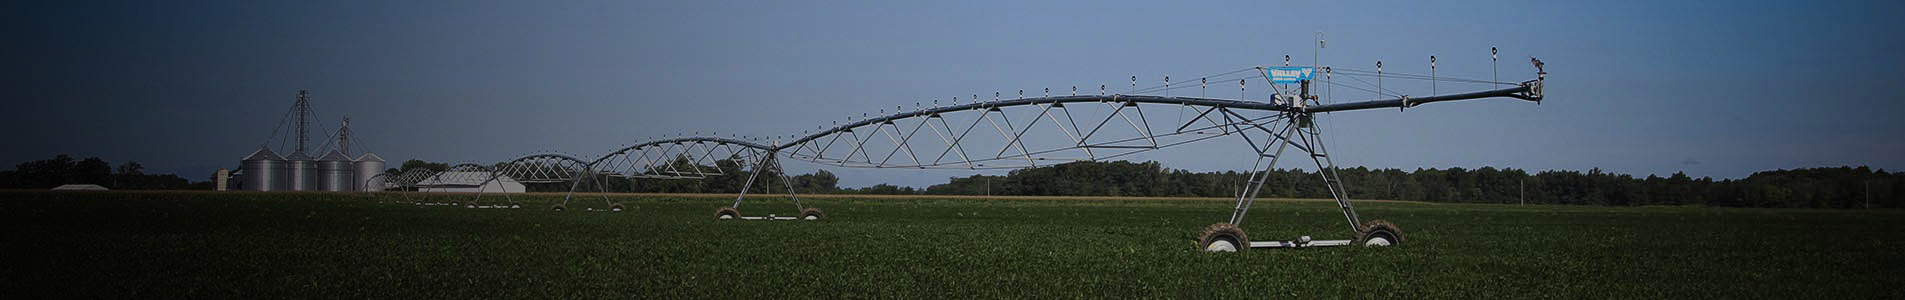 valley irrigation videos